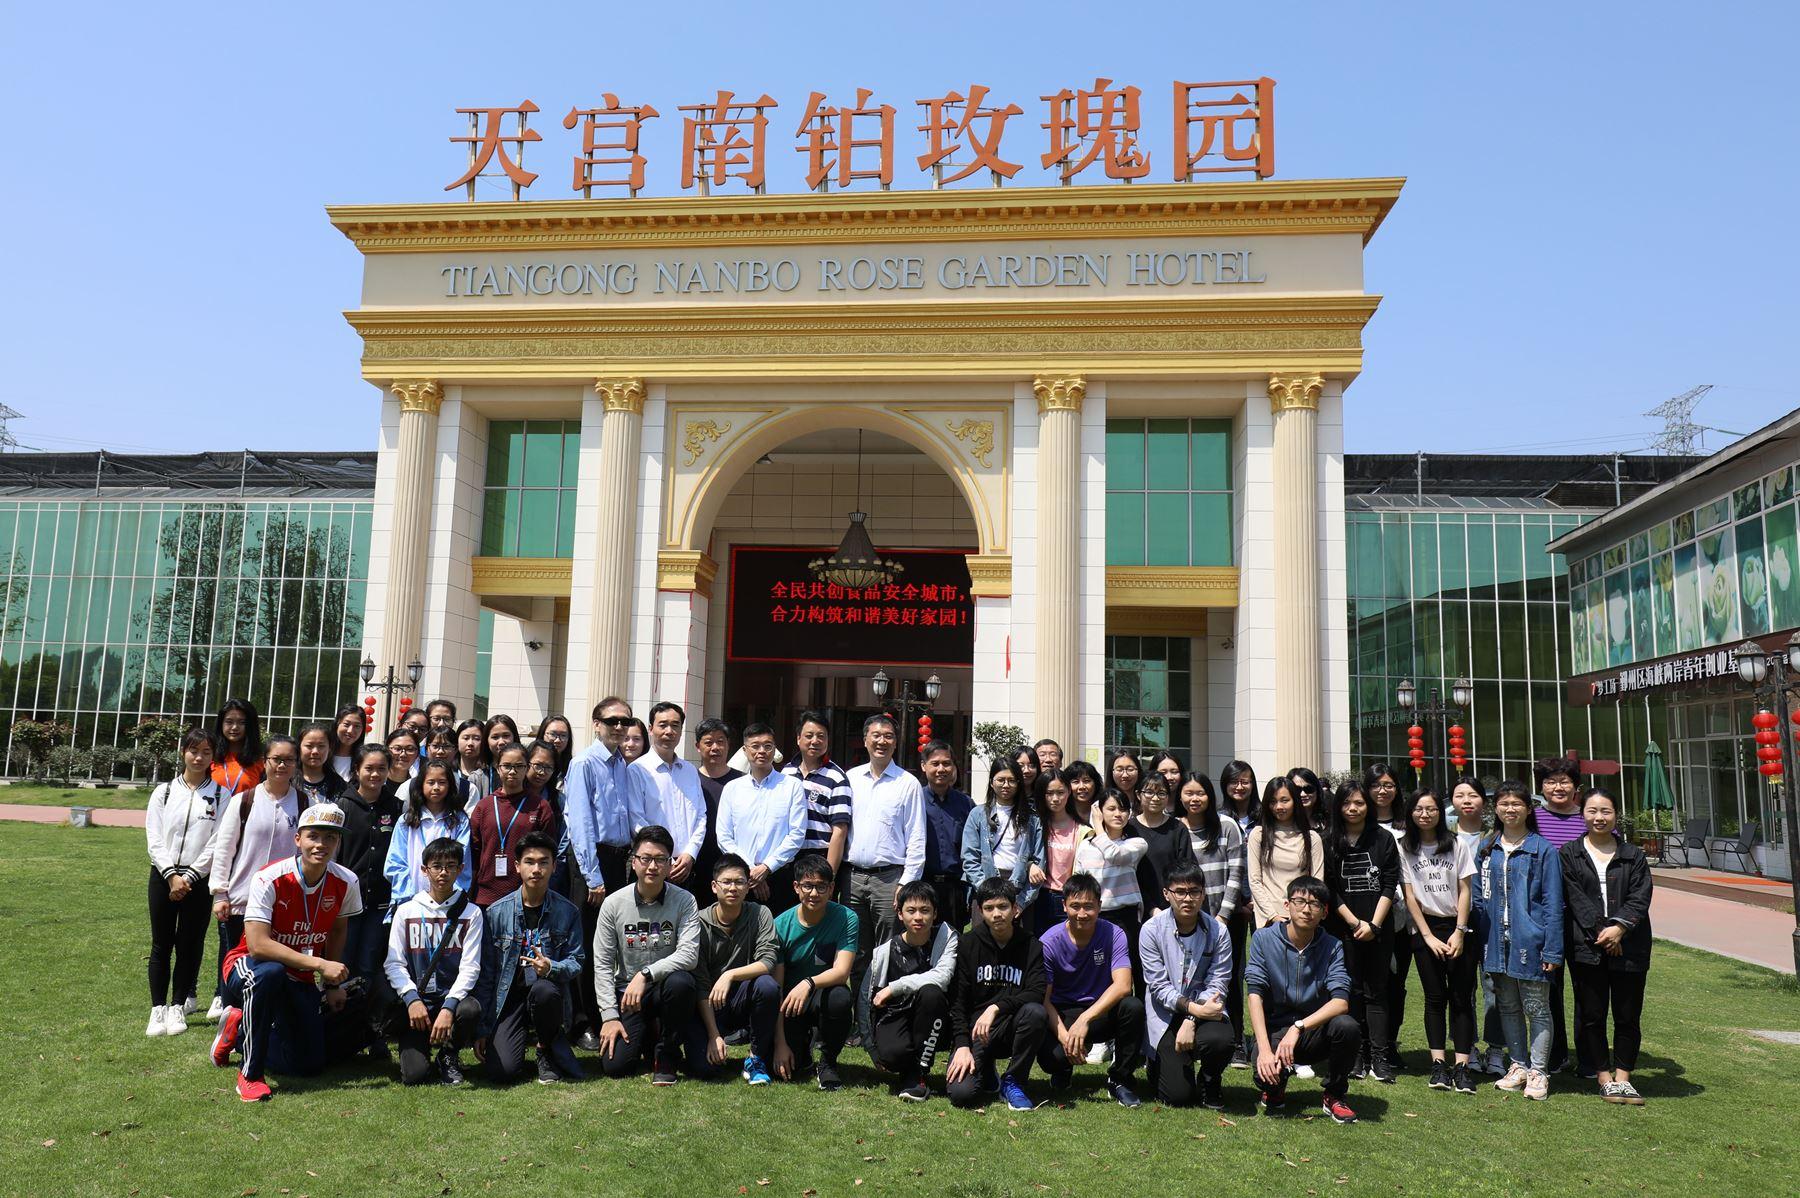 http://npc.edu.hk/sites/default/files/30_23.jpg